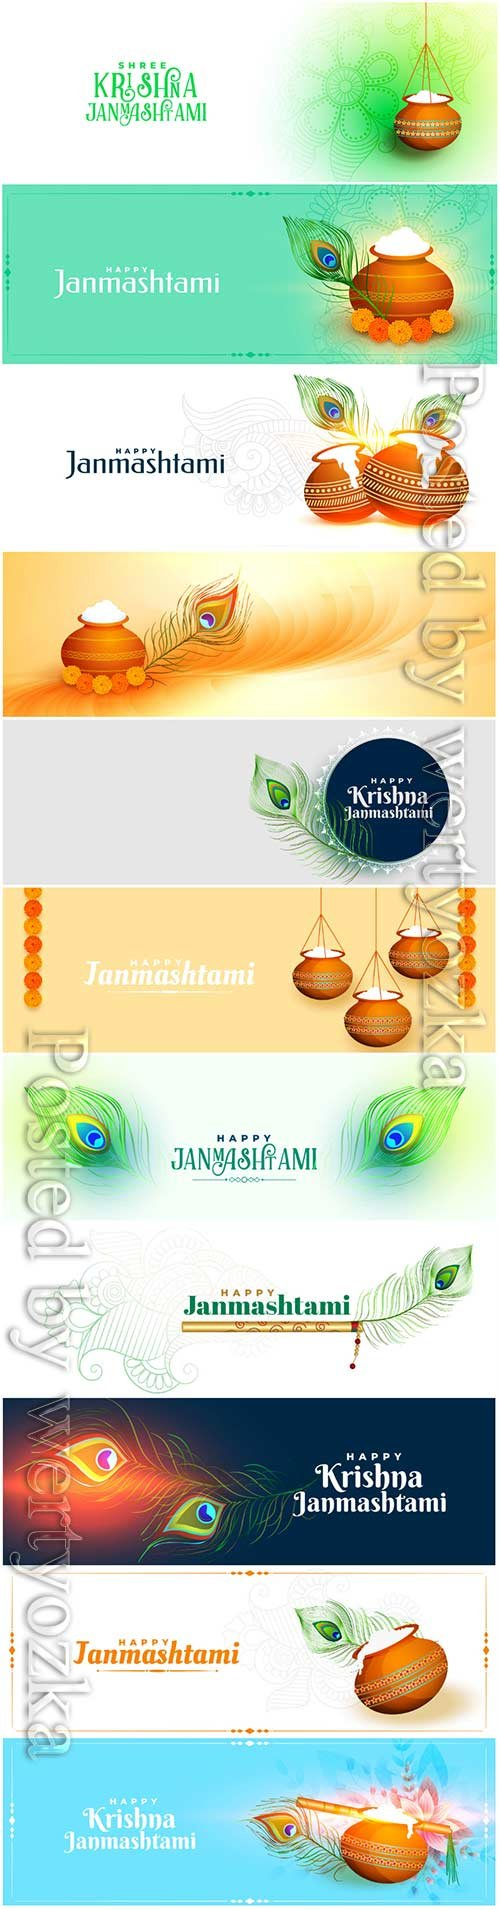 Dahi handi festival of janmashtami with peacock feather vector